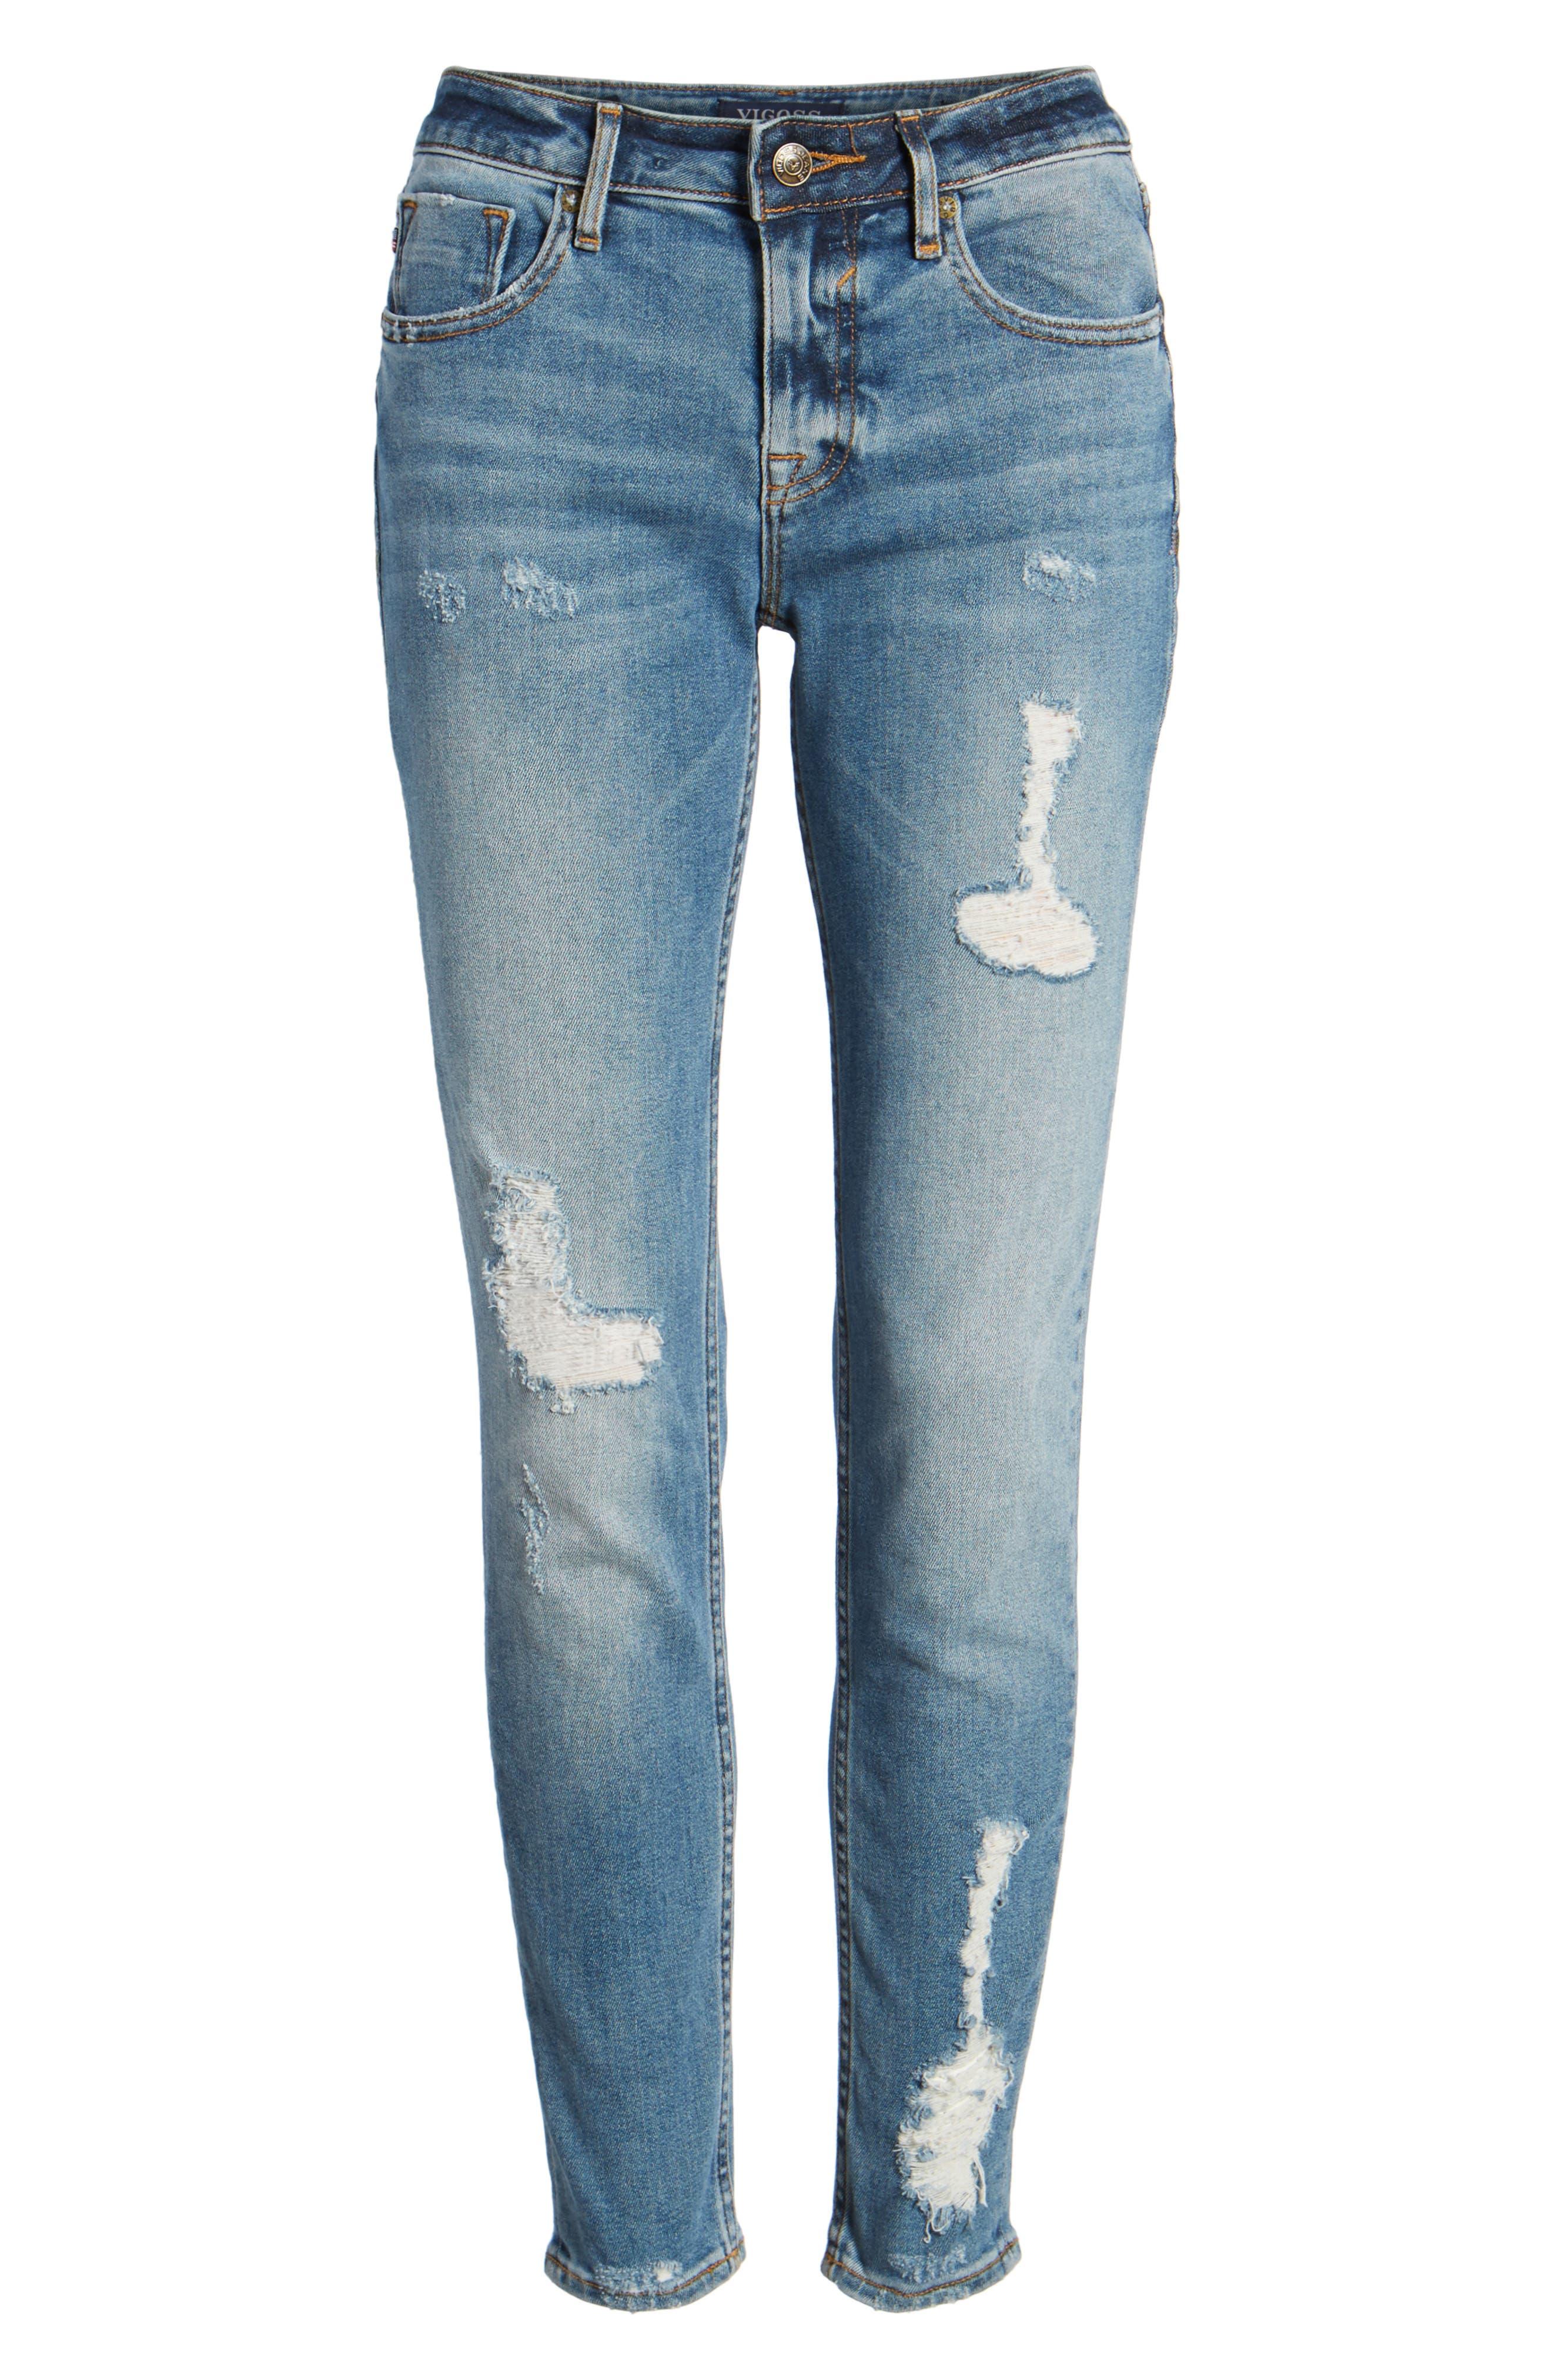 Jagger Decon Distressed Skinny Jeans,                             Alternate thumbnail 7, color,                             Medium Wash